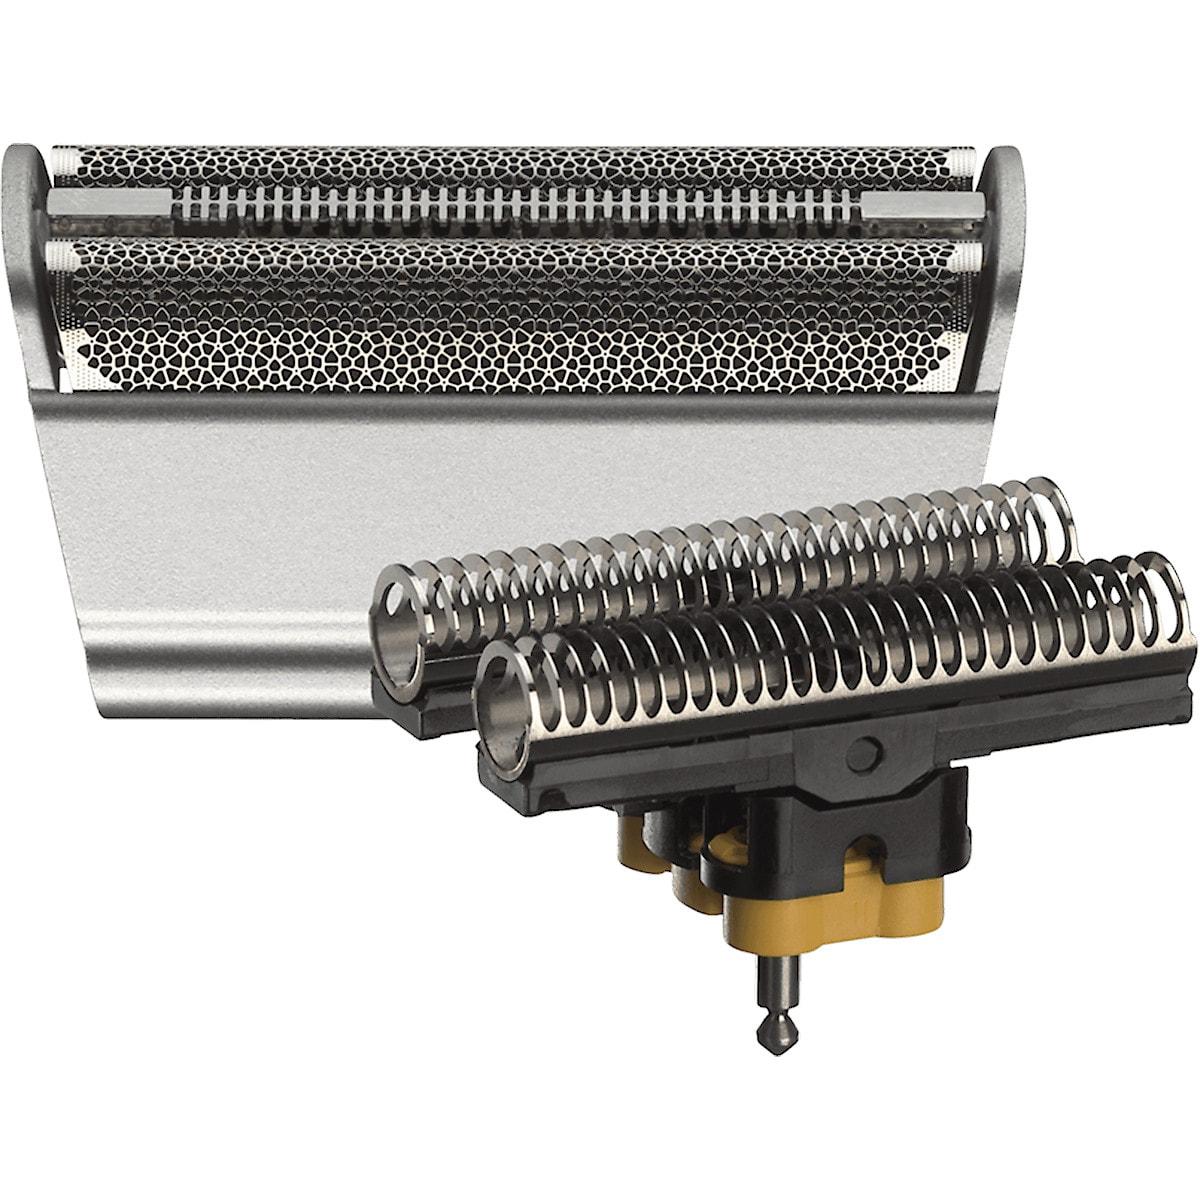 Braun 31S Series 3, barberhode silver